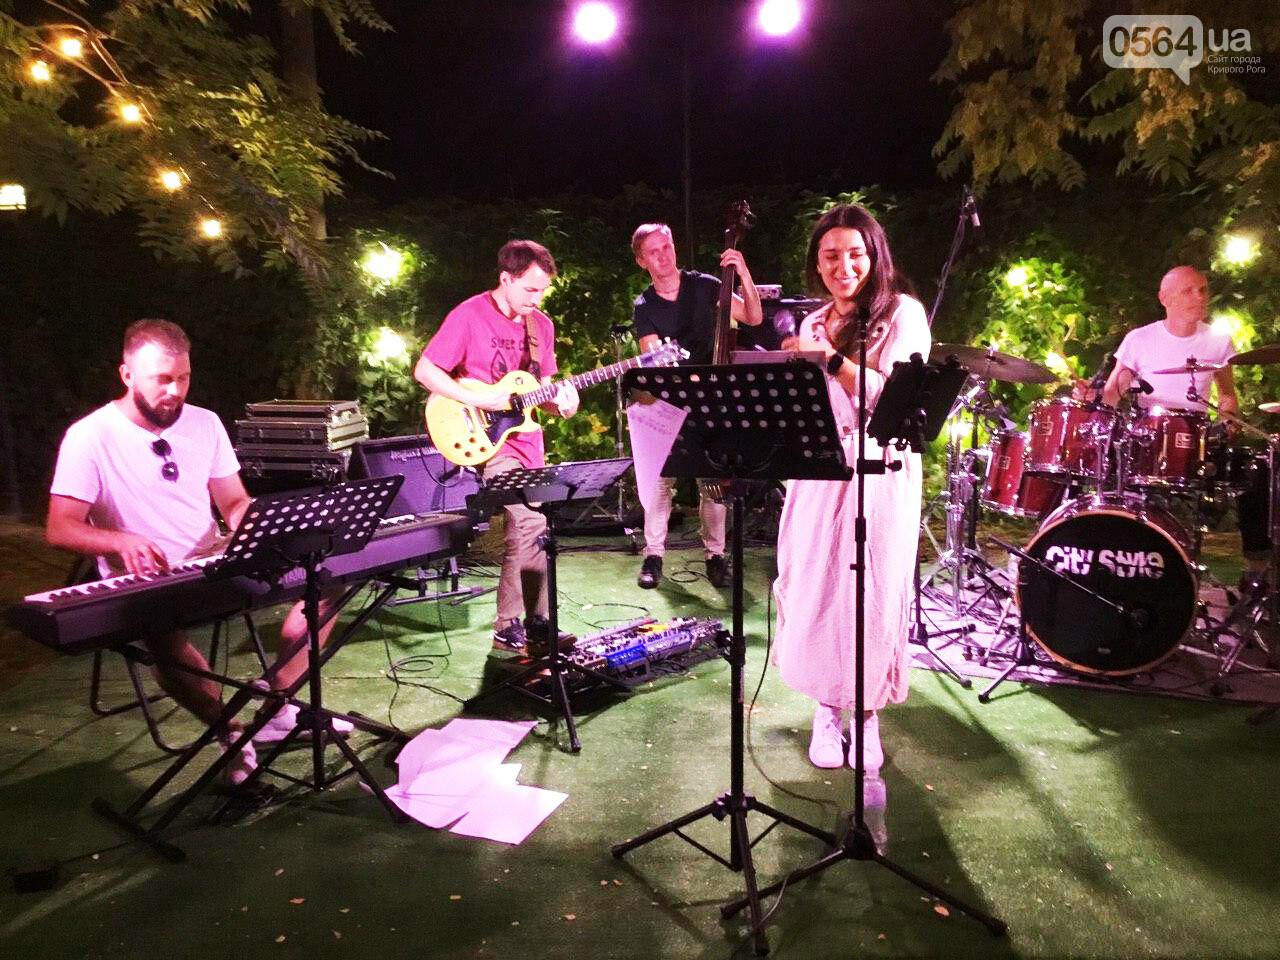 Под звездным небом криворожане наслаждались летним джазом от  Advantage Project, - ФОТО, ВИДЕО , фото-12